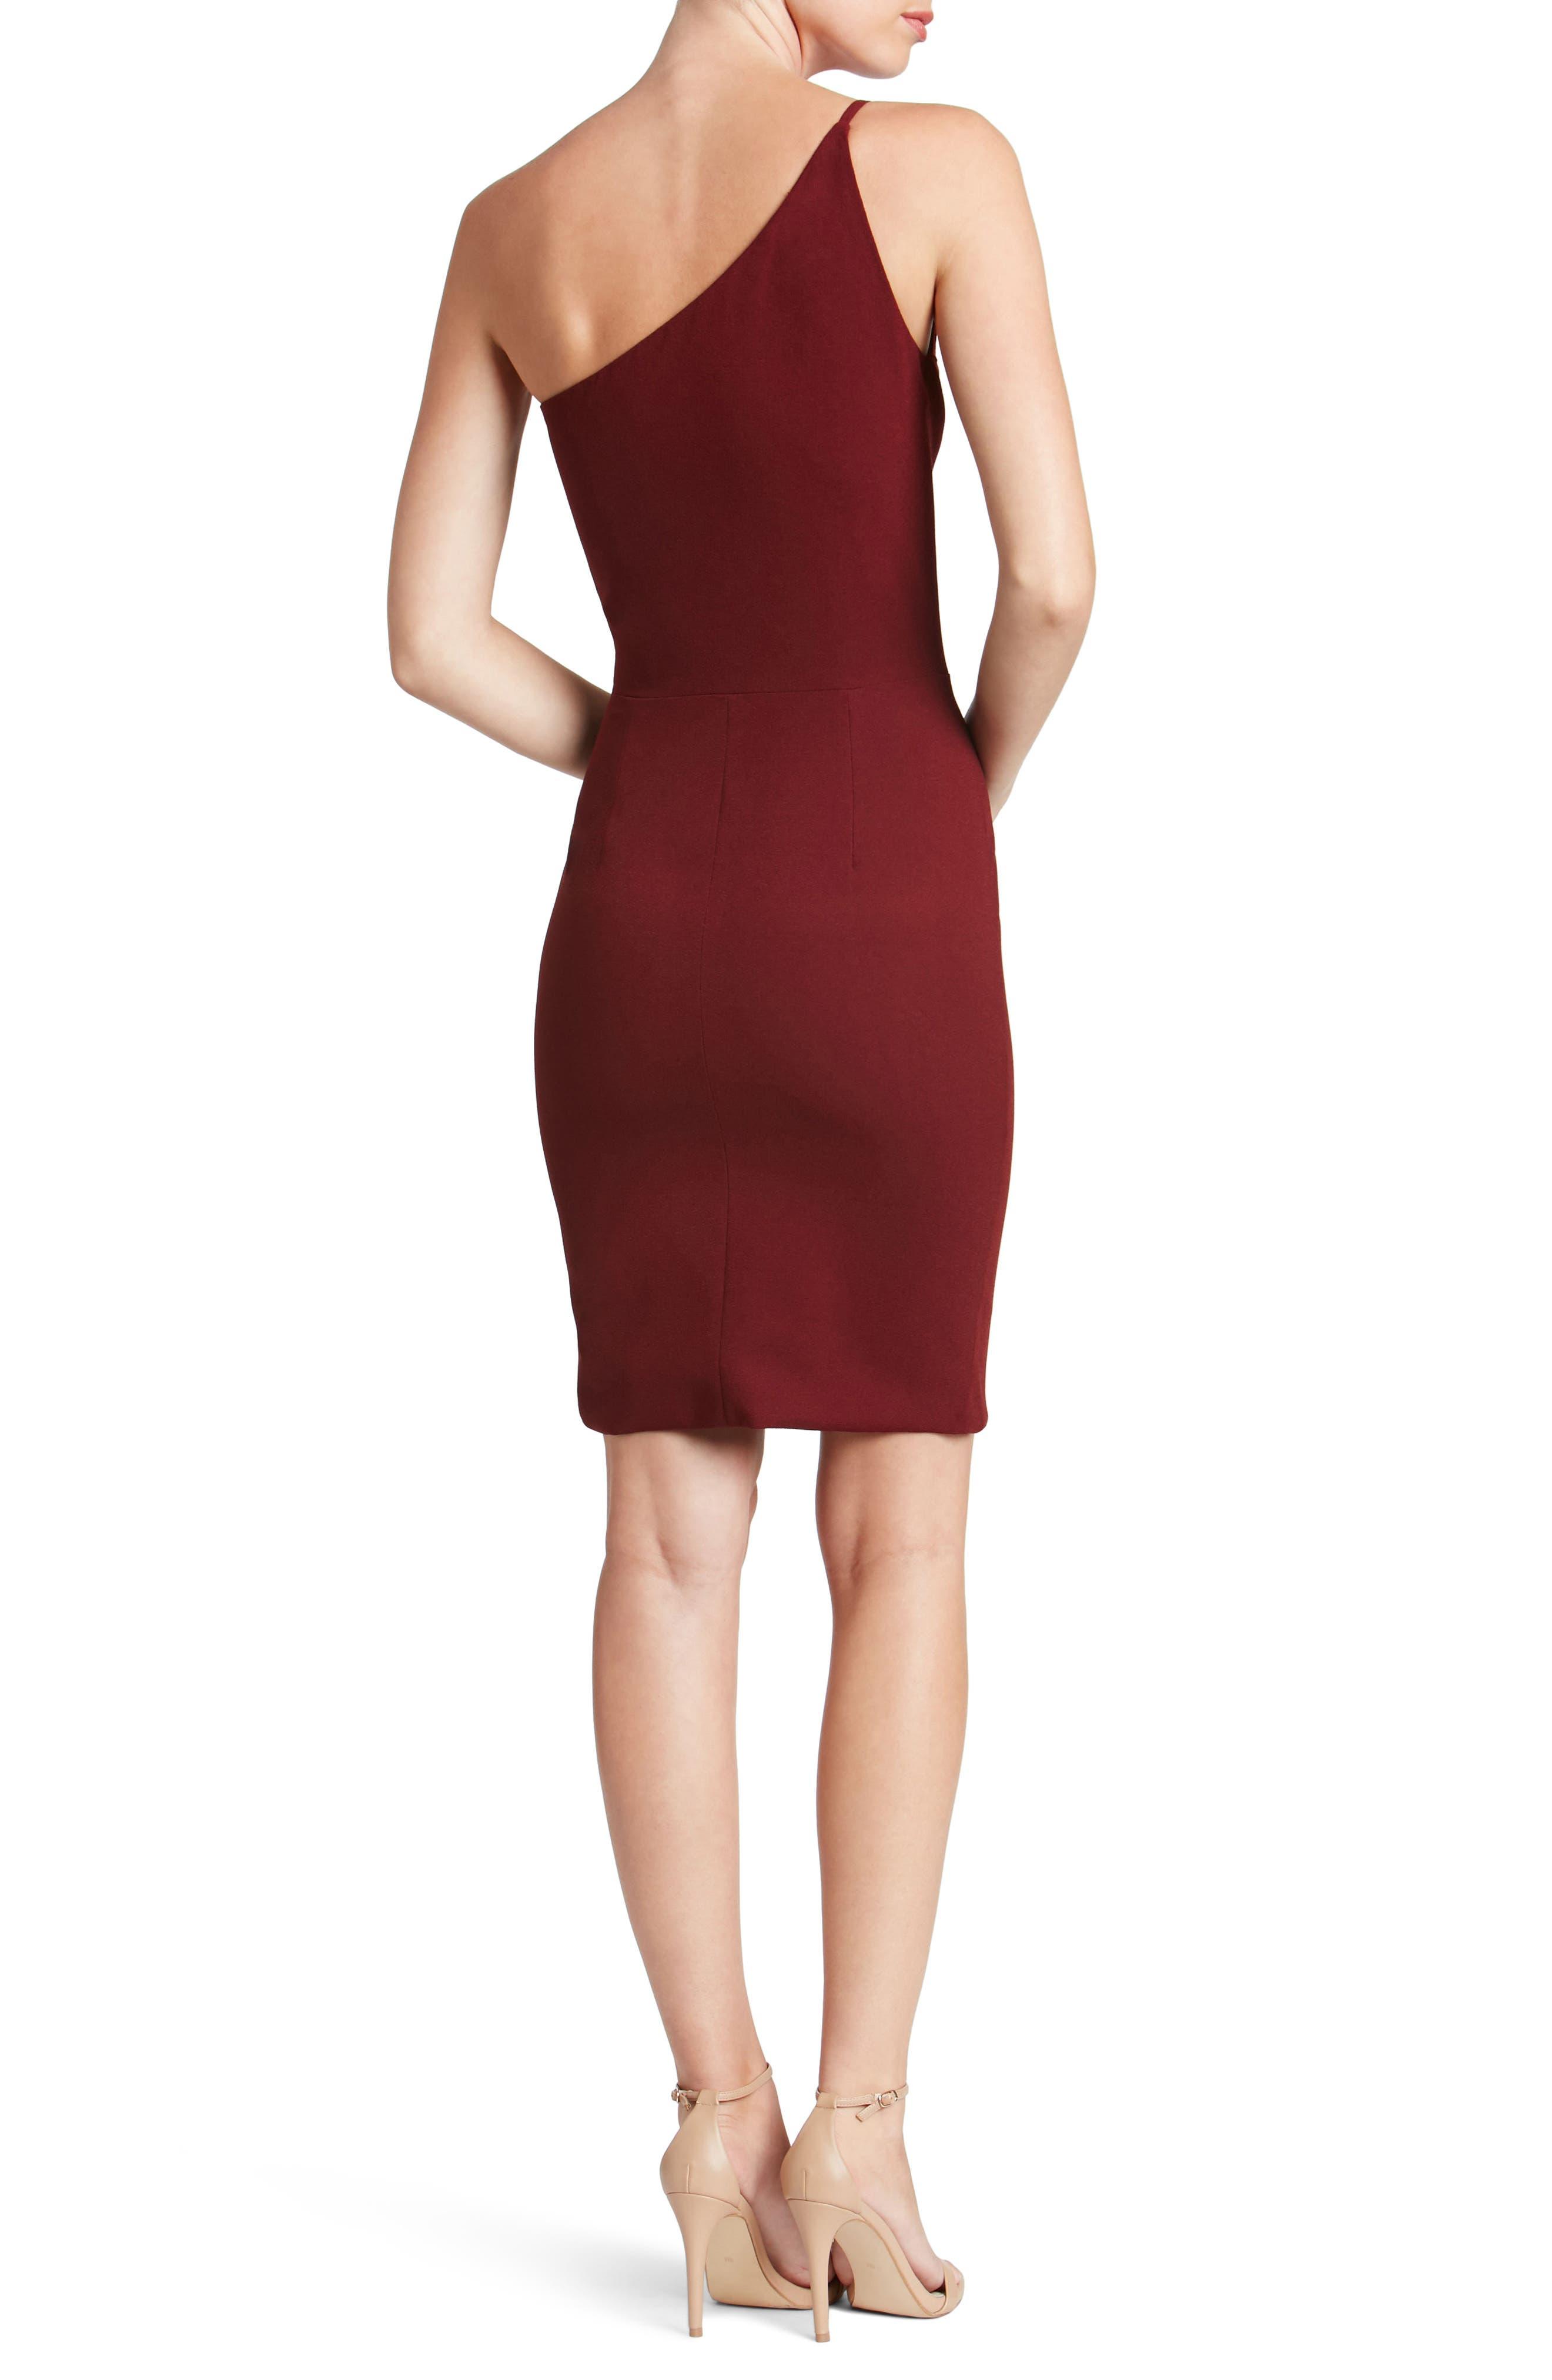 Jennifer One-Shoulder Body-Con Dress,                             Alternate thumbnail 3, color,                             Burgundy